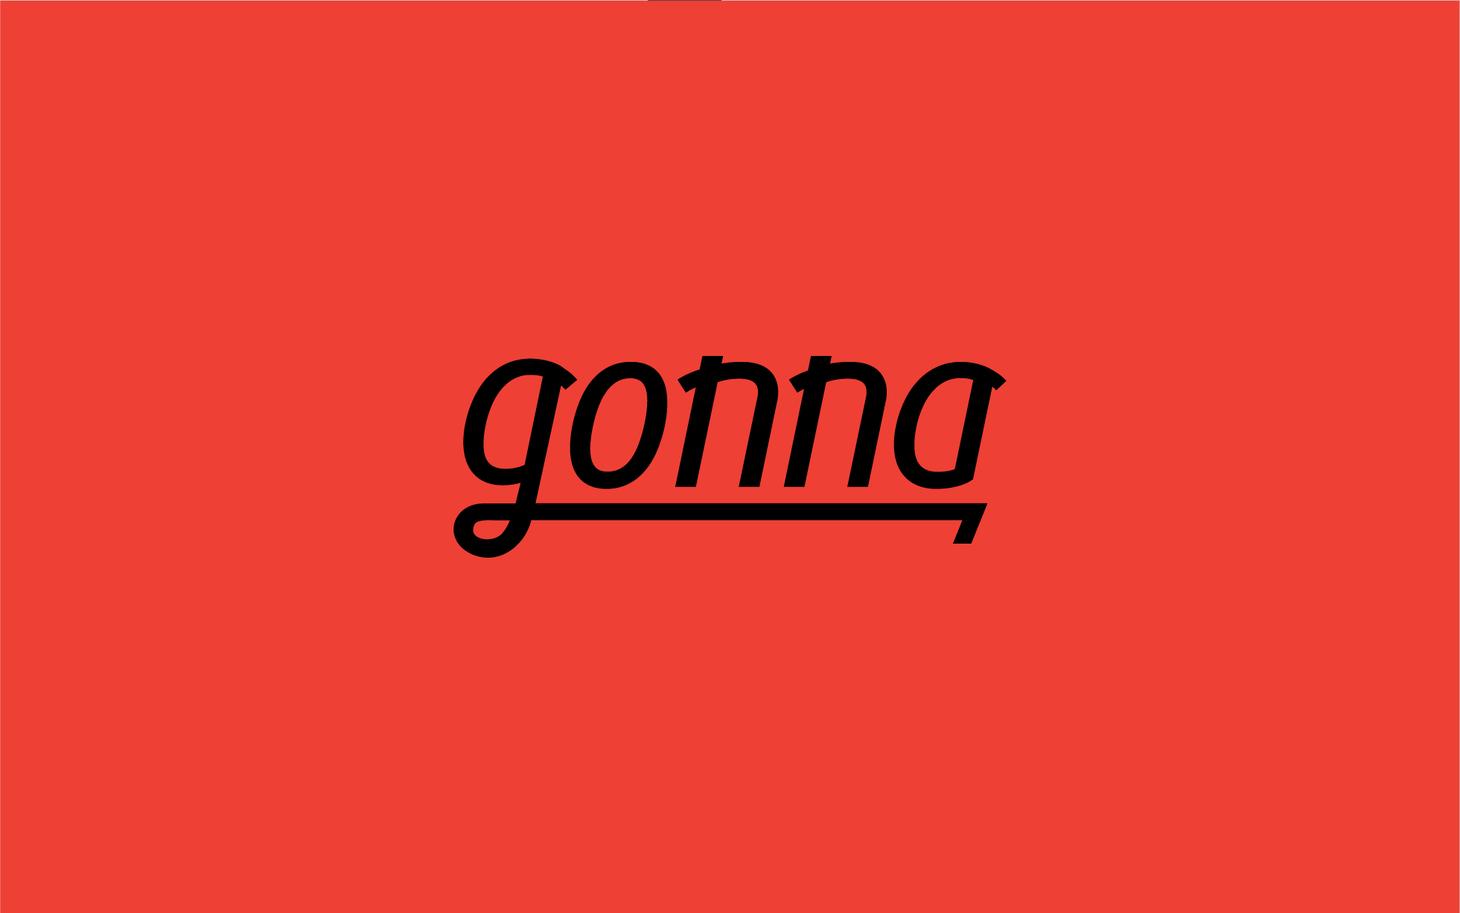 Gonna-02.jpg